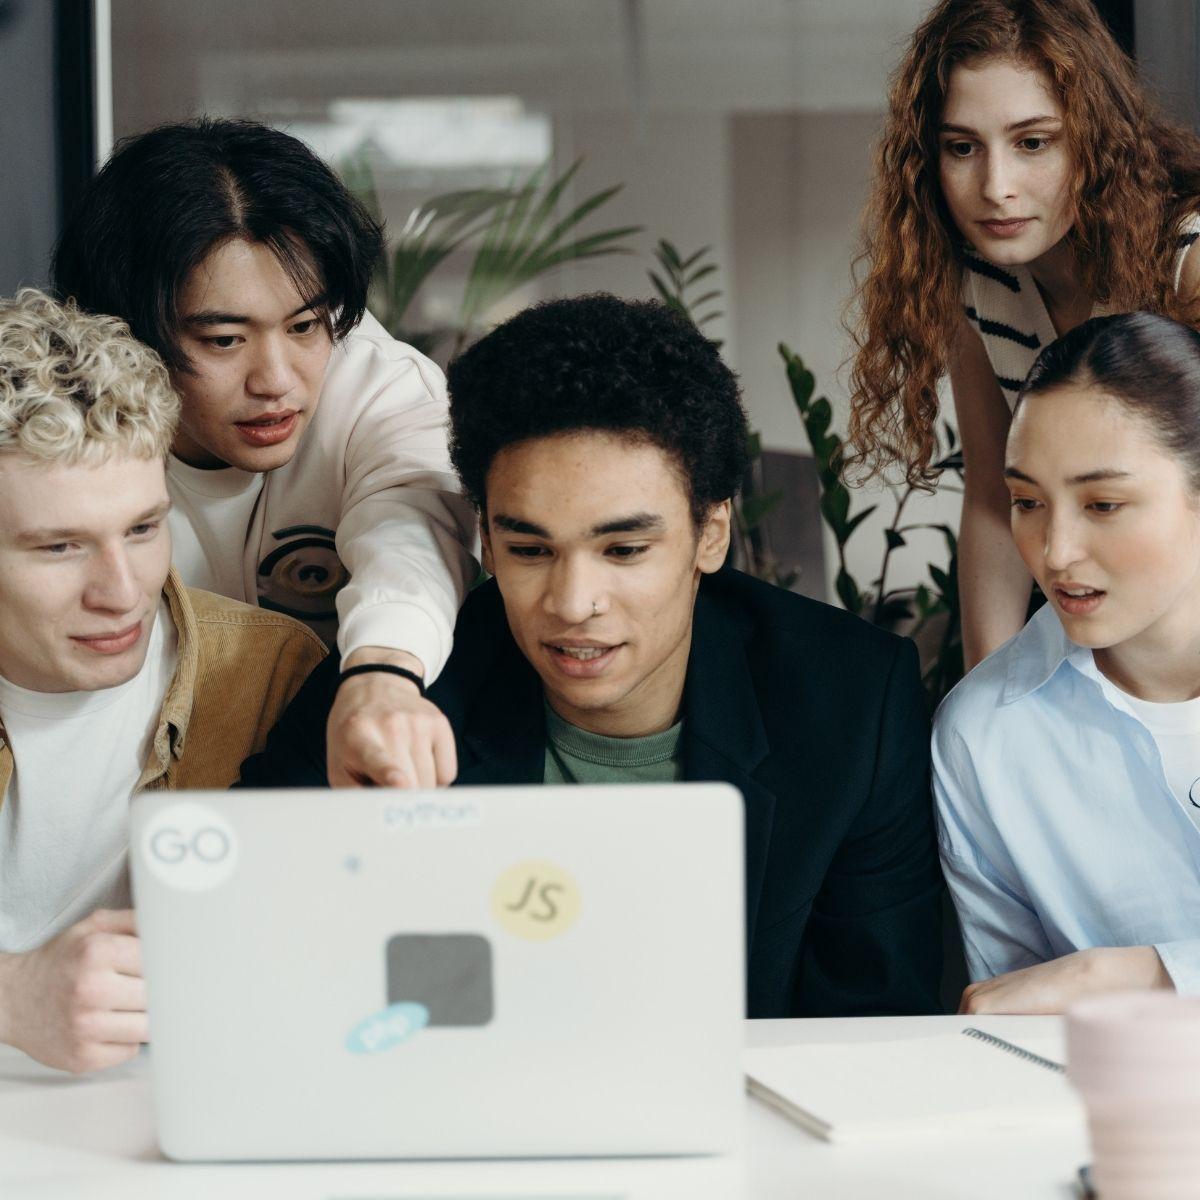 group crowds around computer screen